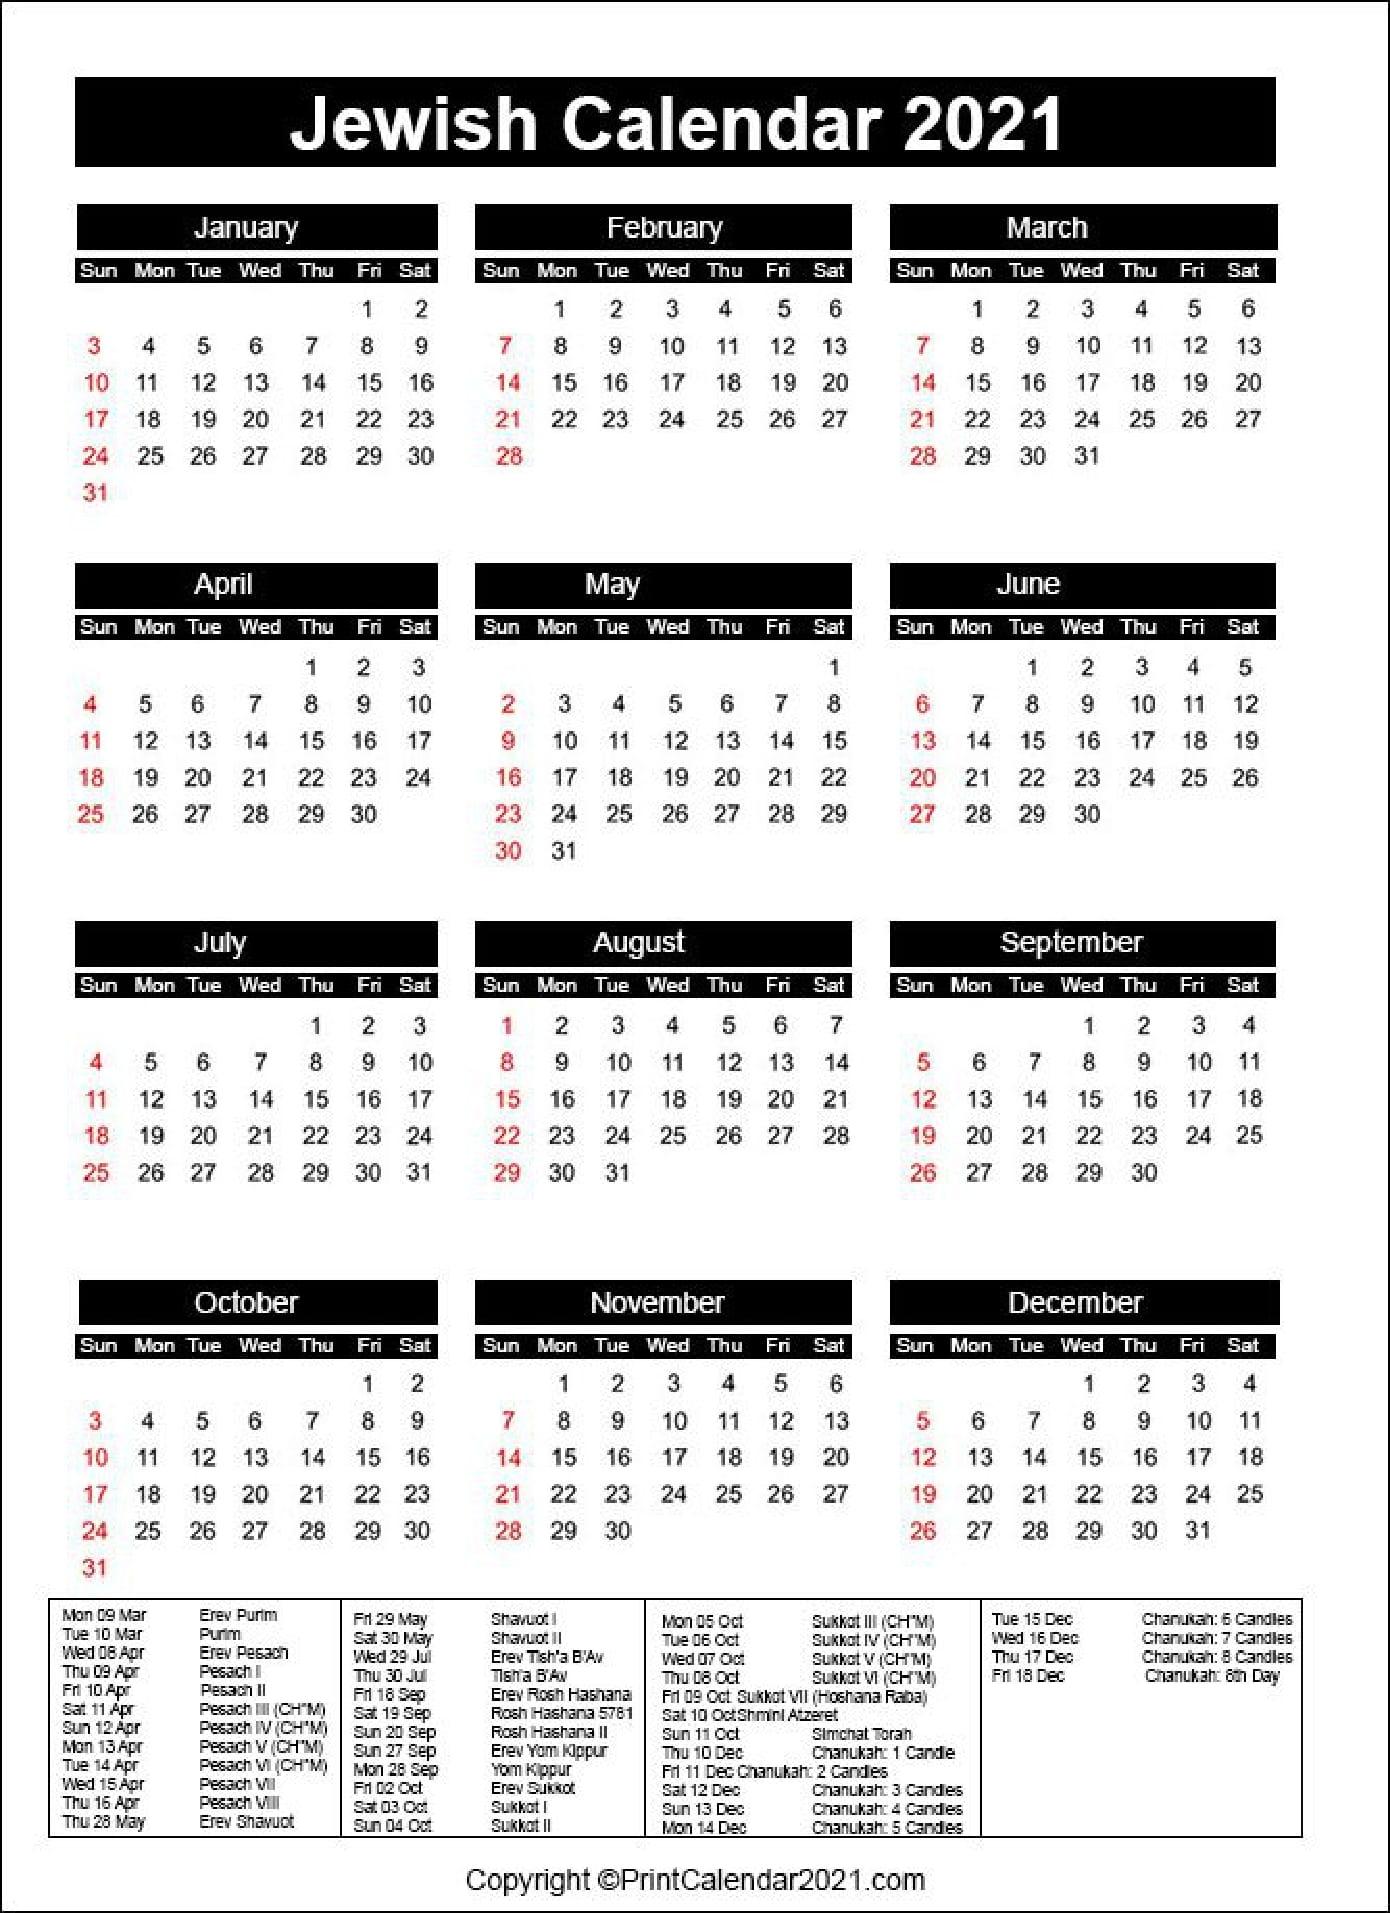 Take Jewish Calendar Year 2021